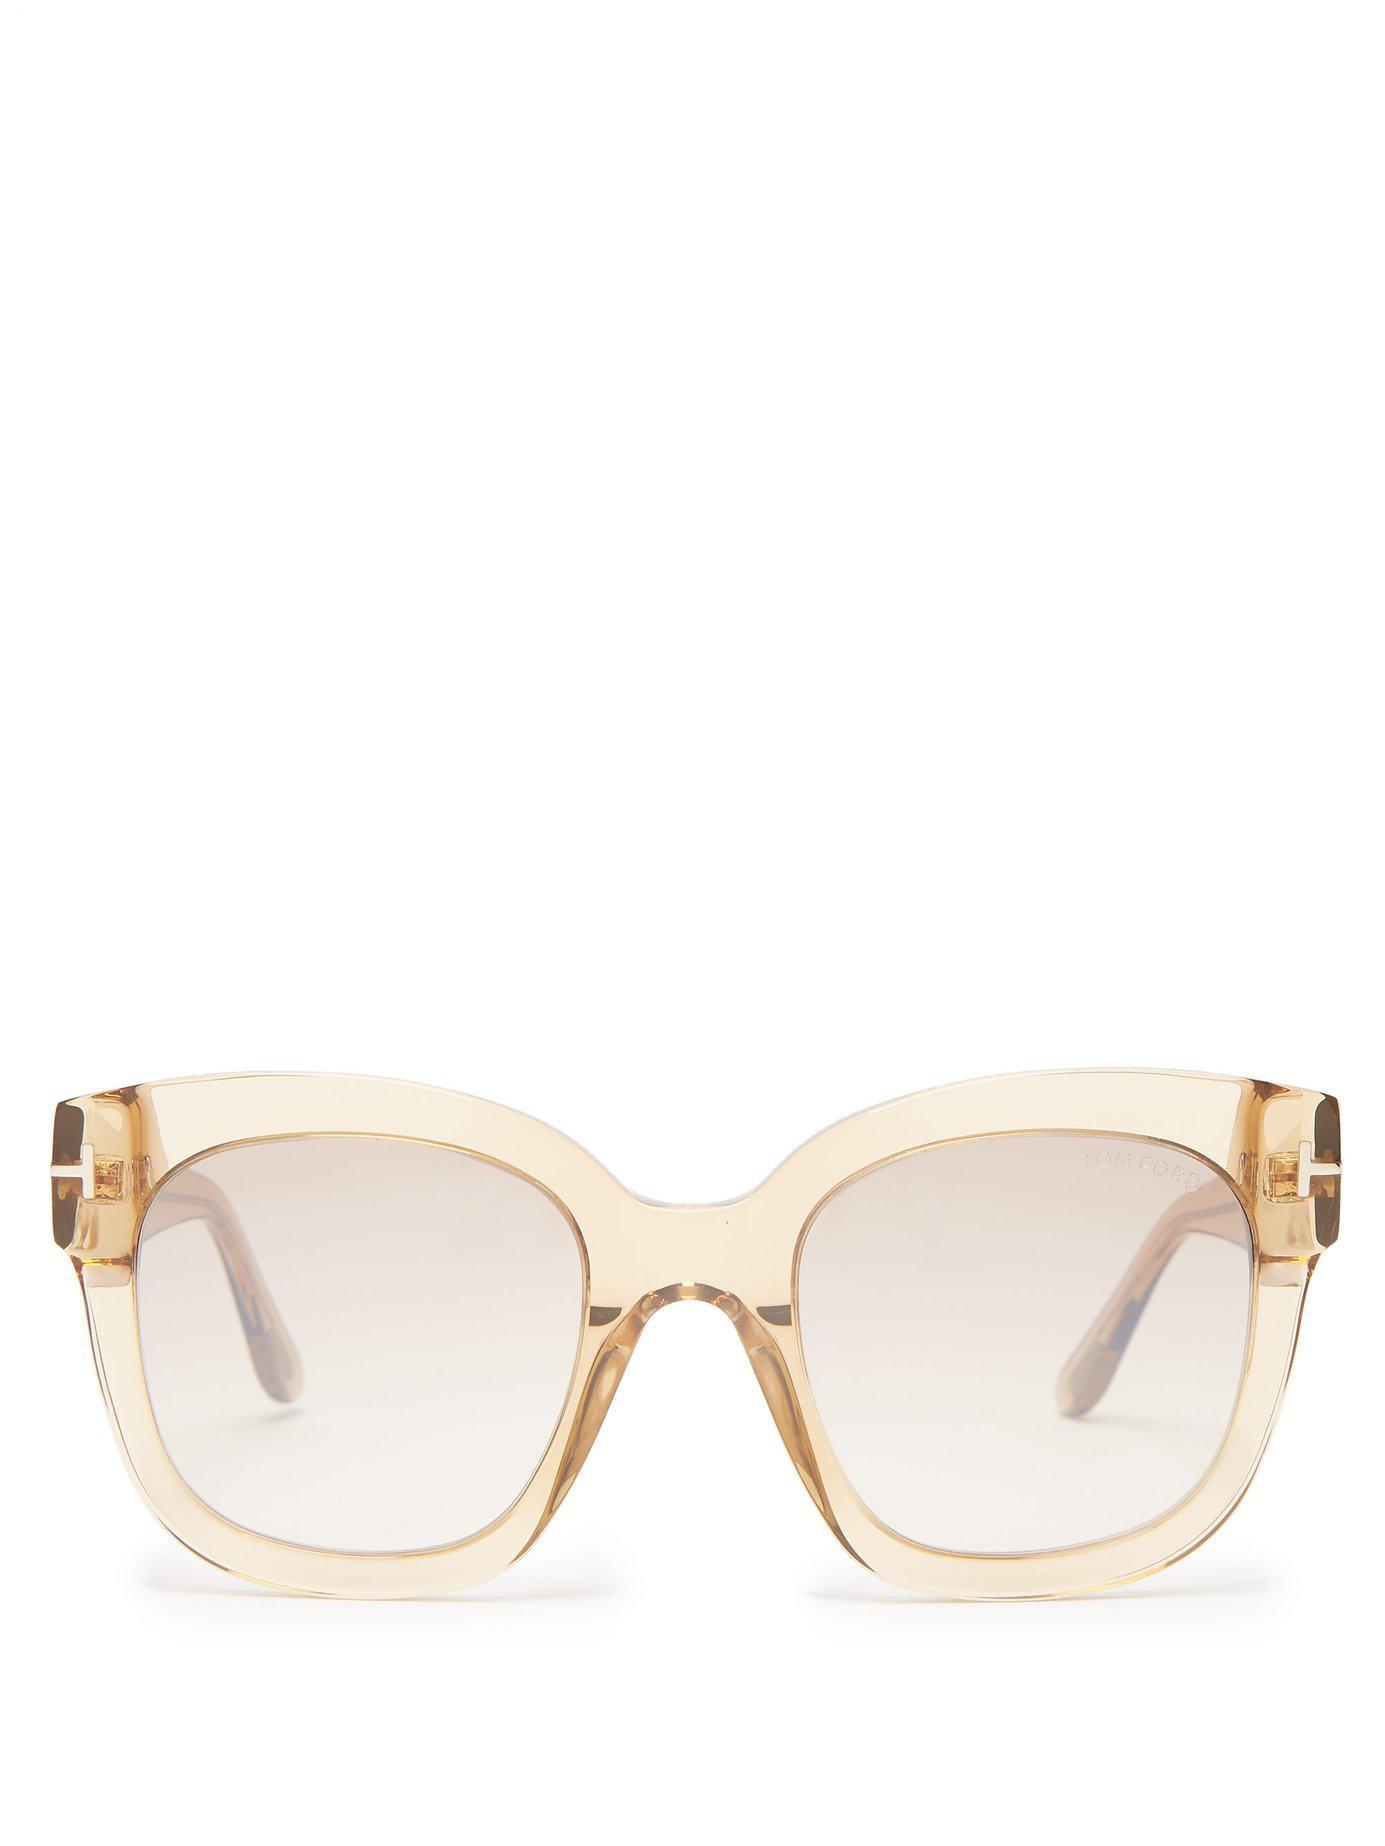 69c661adf0 Tom Ford Beatrix Acetate Sunglasses in Brown - Lyst